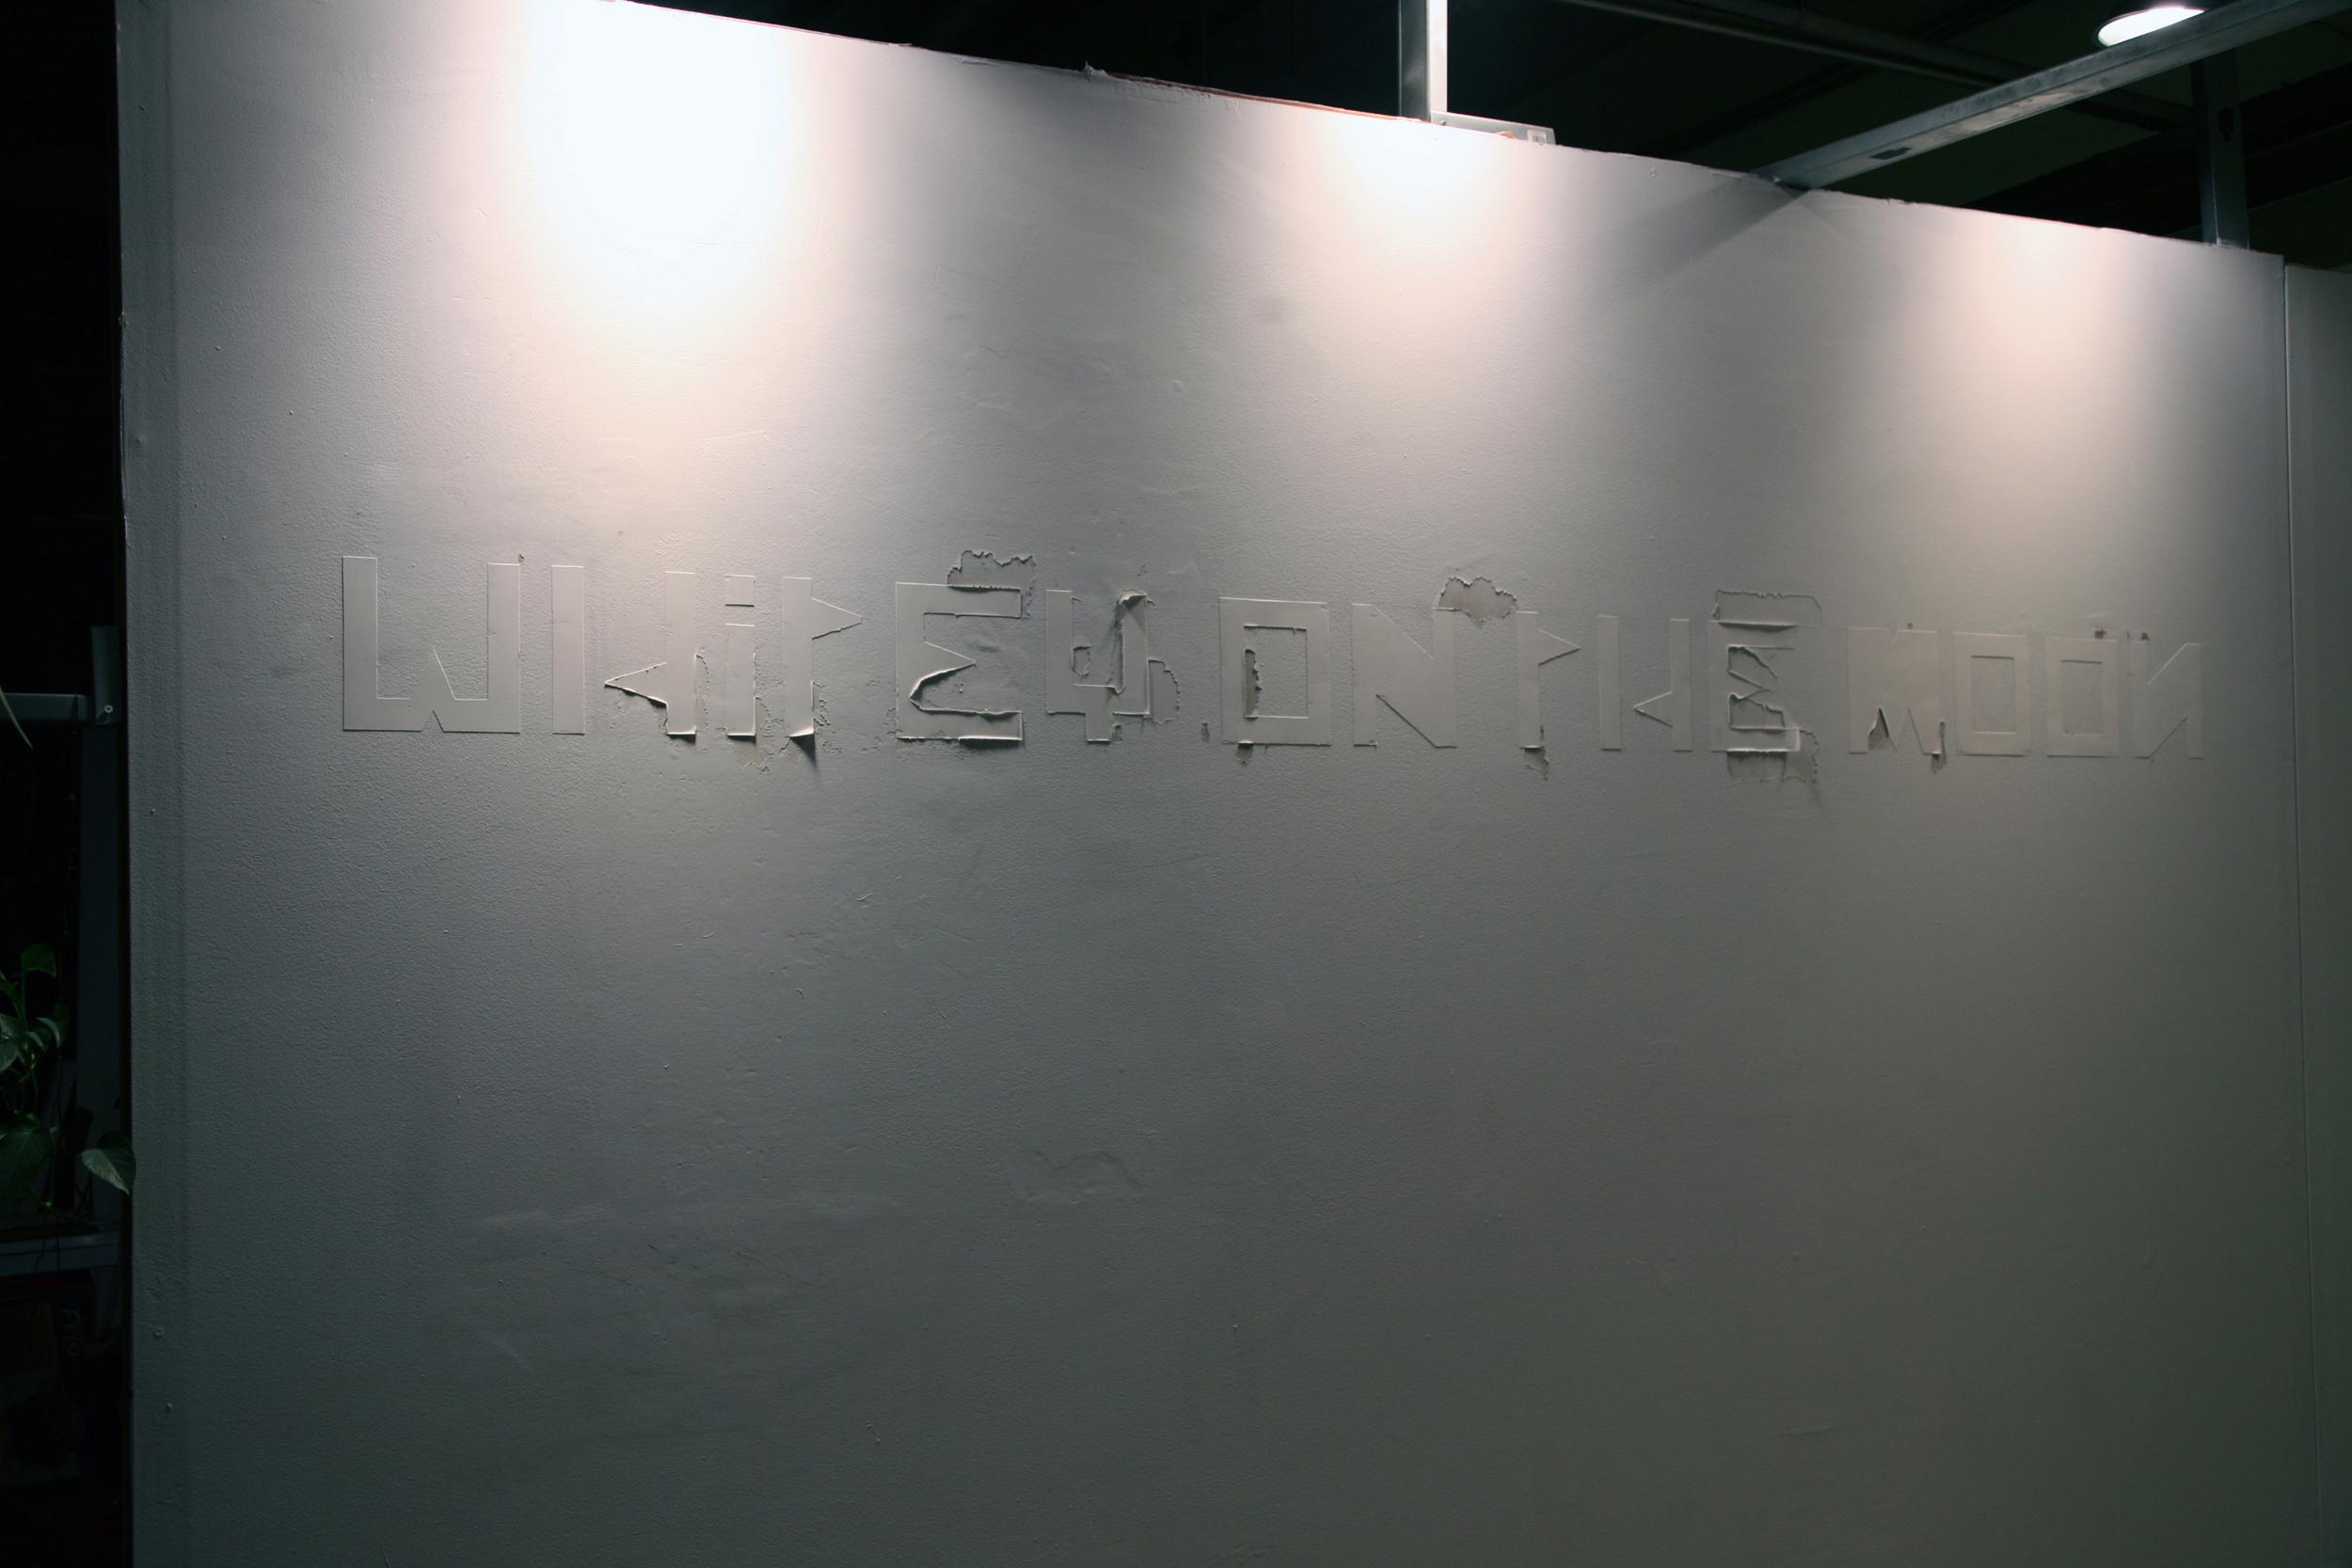 Title Wall. Mitchell Wright.